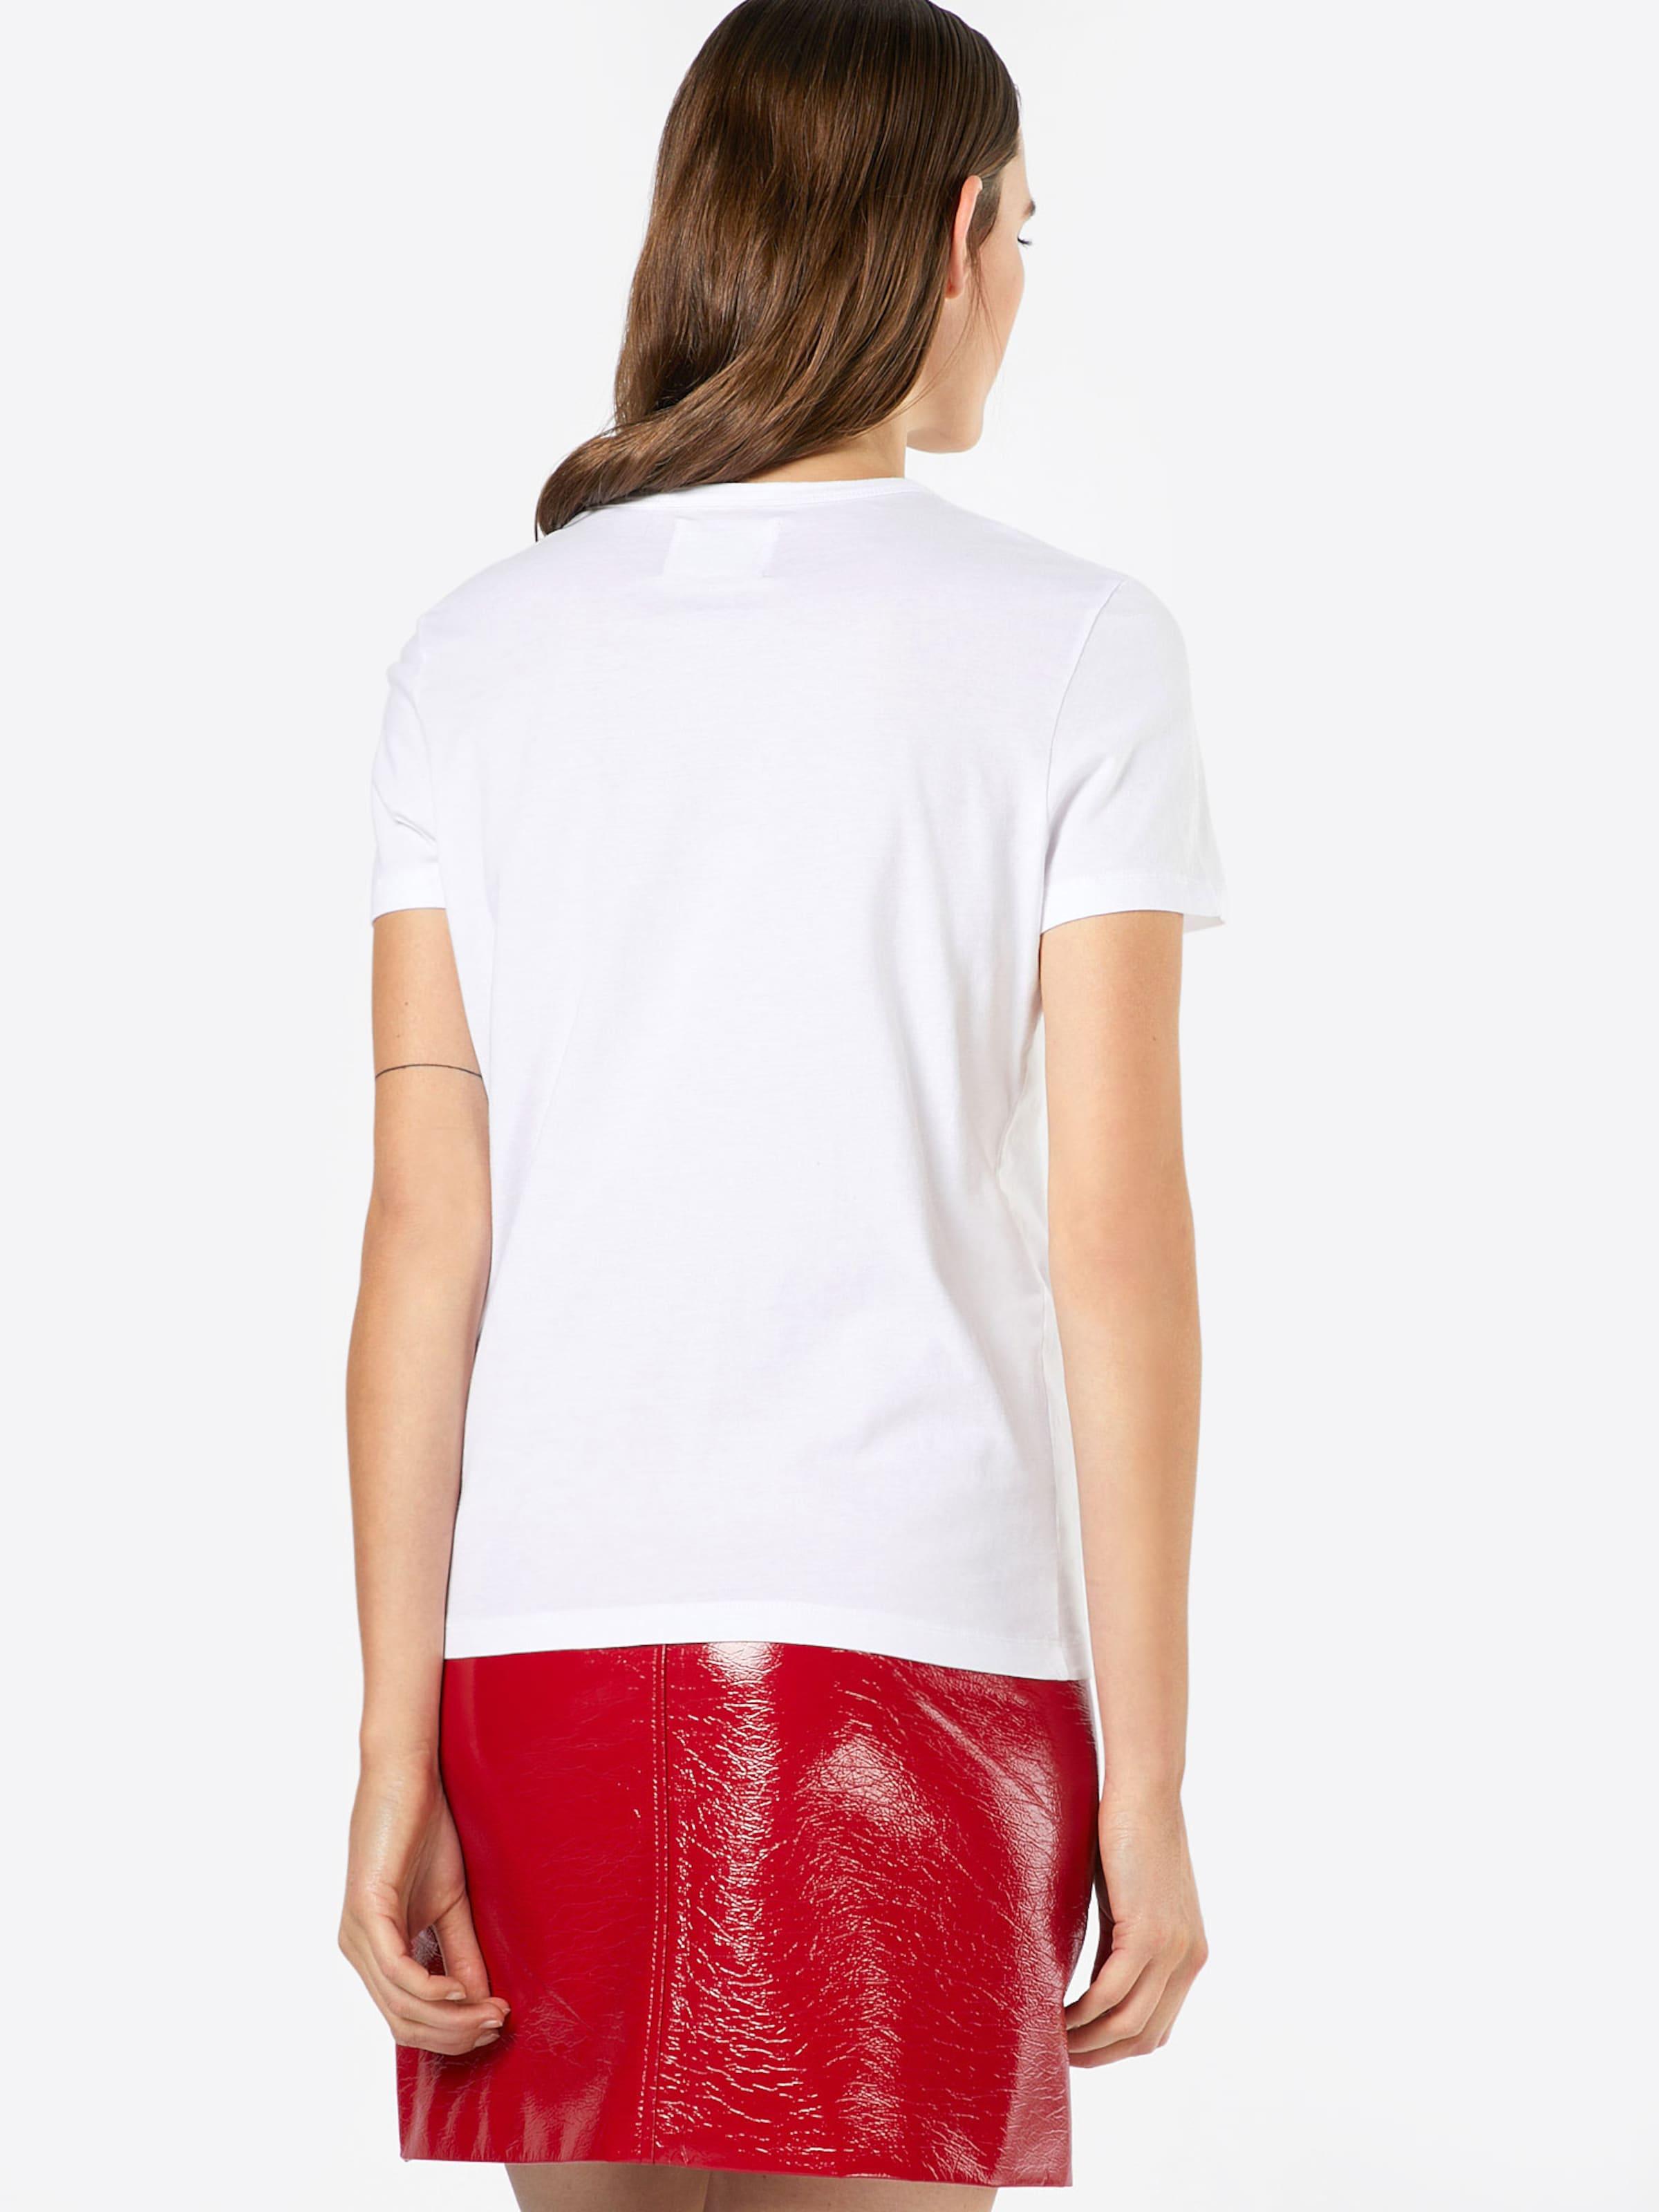 Blanc En T shirt 'uma' Wood vnN0wm8